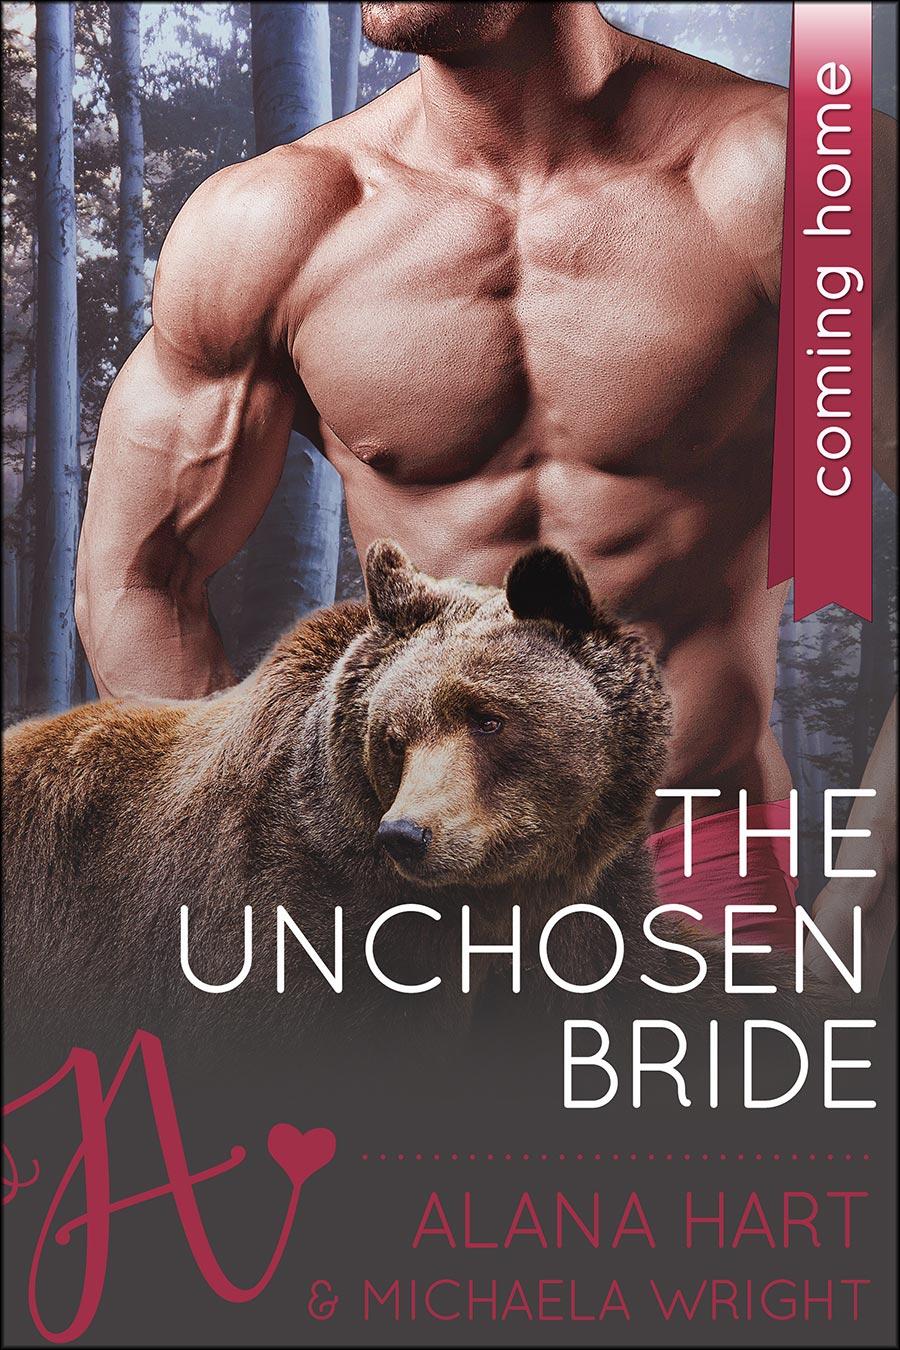 The-Unchosen-Bride.jpg